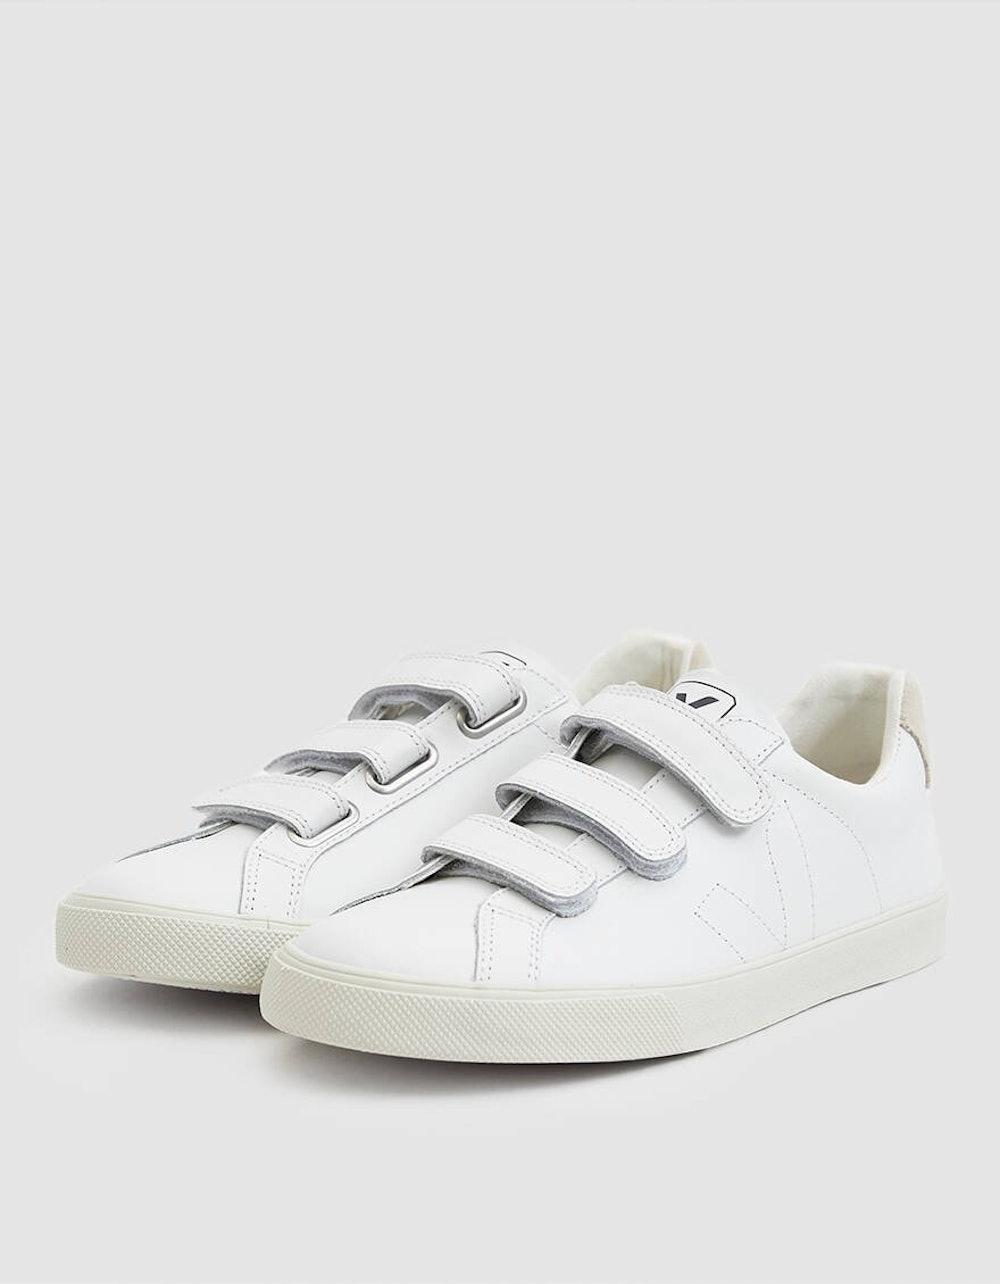 Esplar Leather 3-Lock Sneaker In Extra White in White